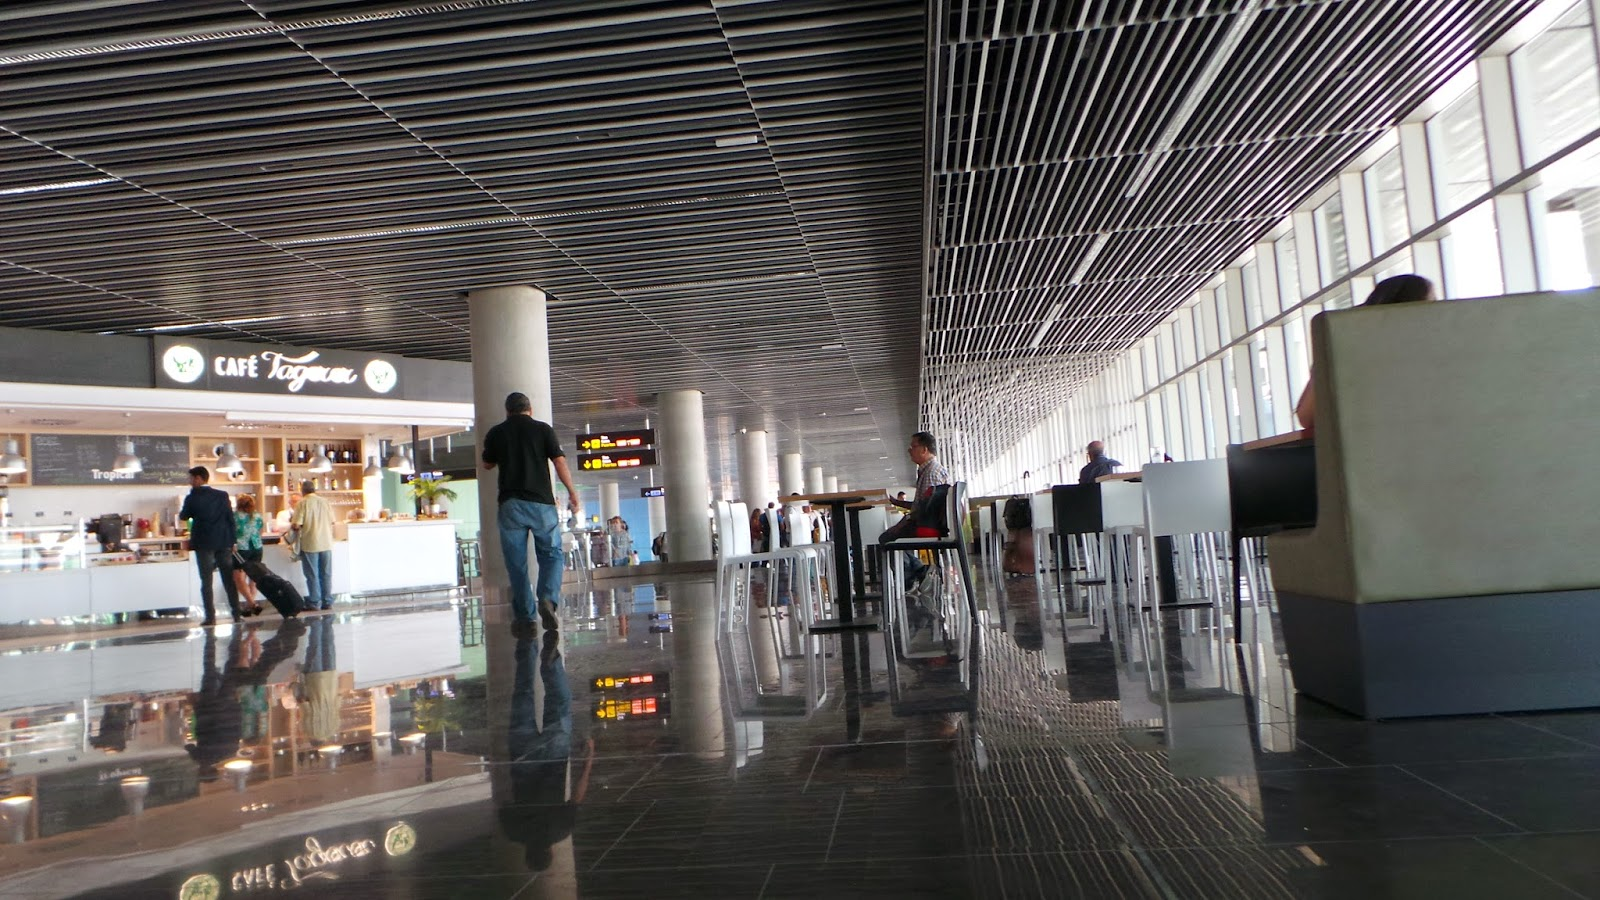 Terminal Salidas Nueva Terminal de Salidas